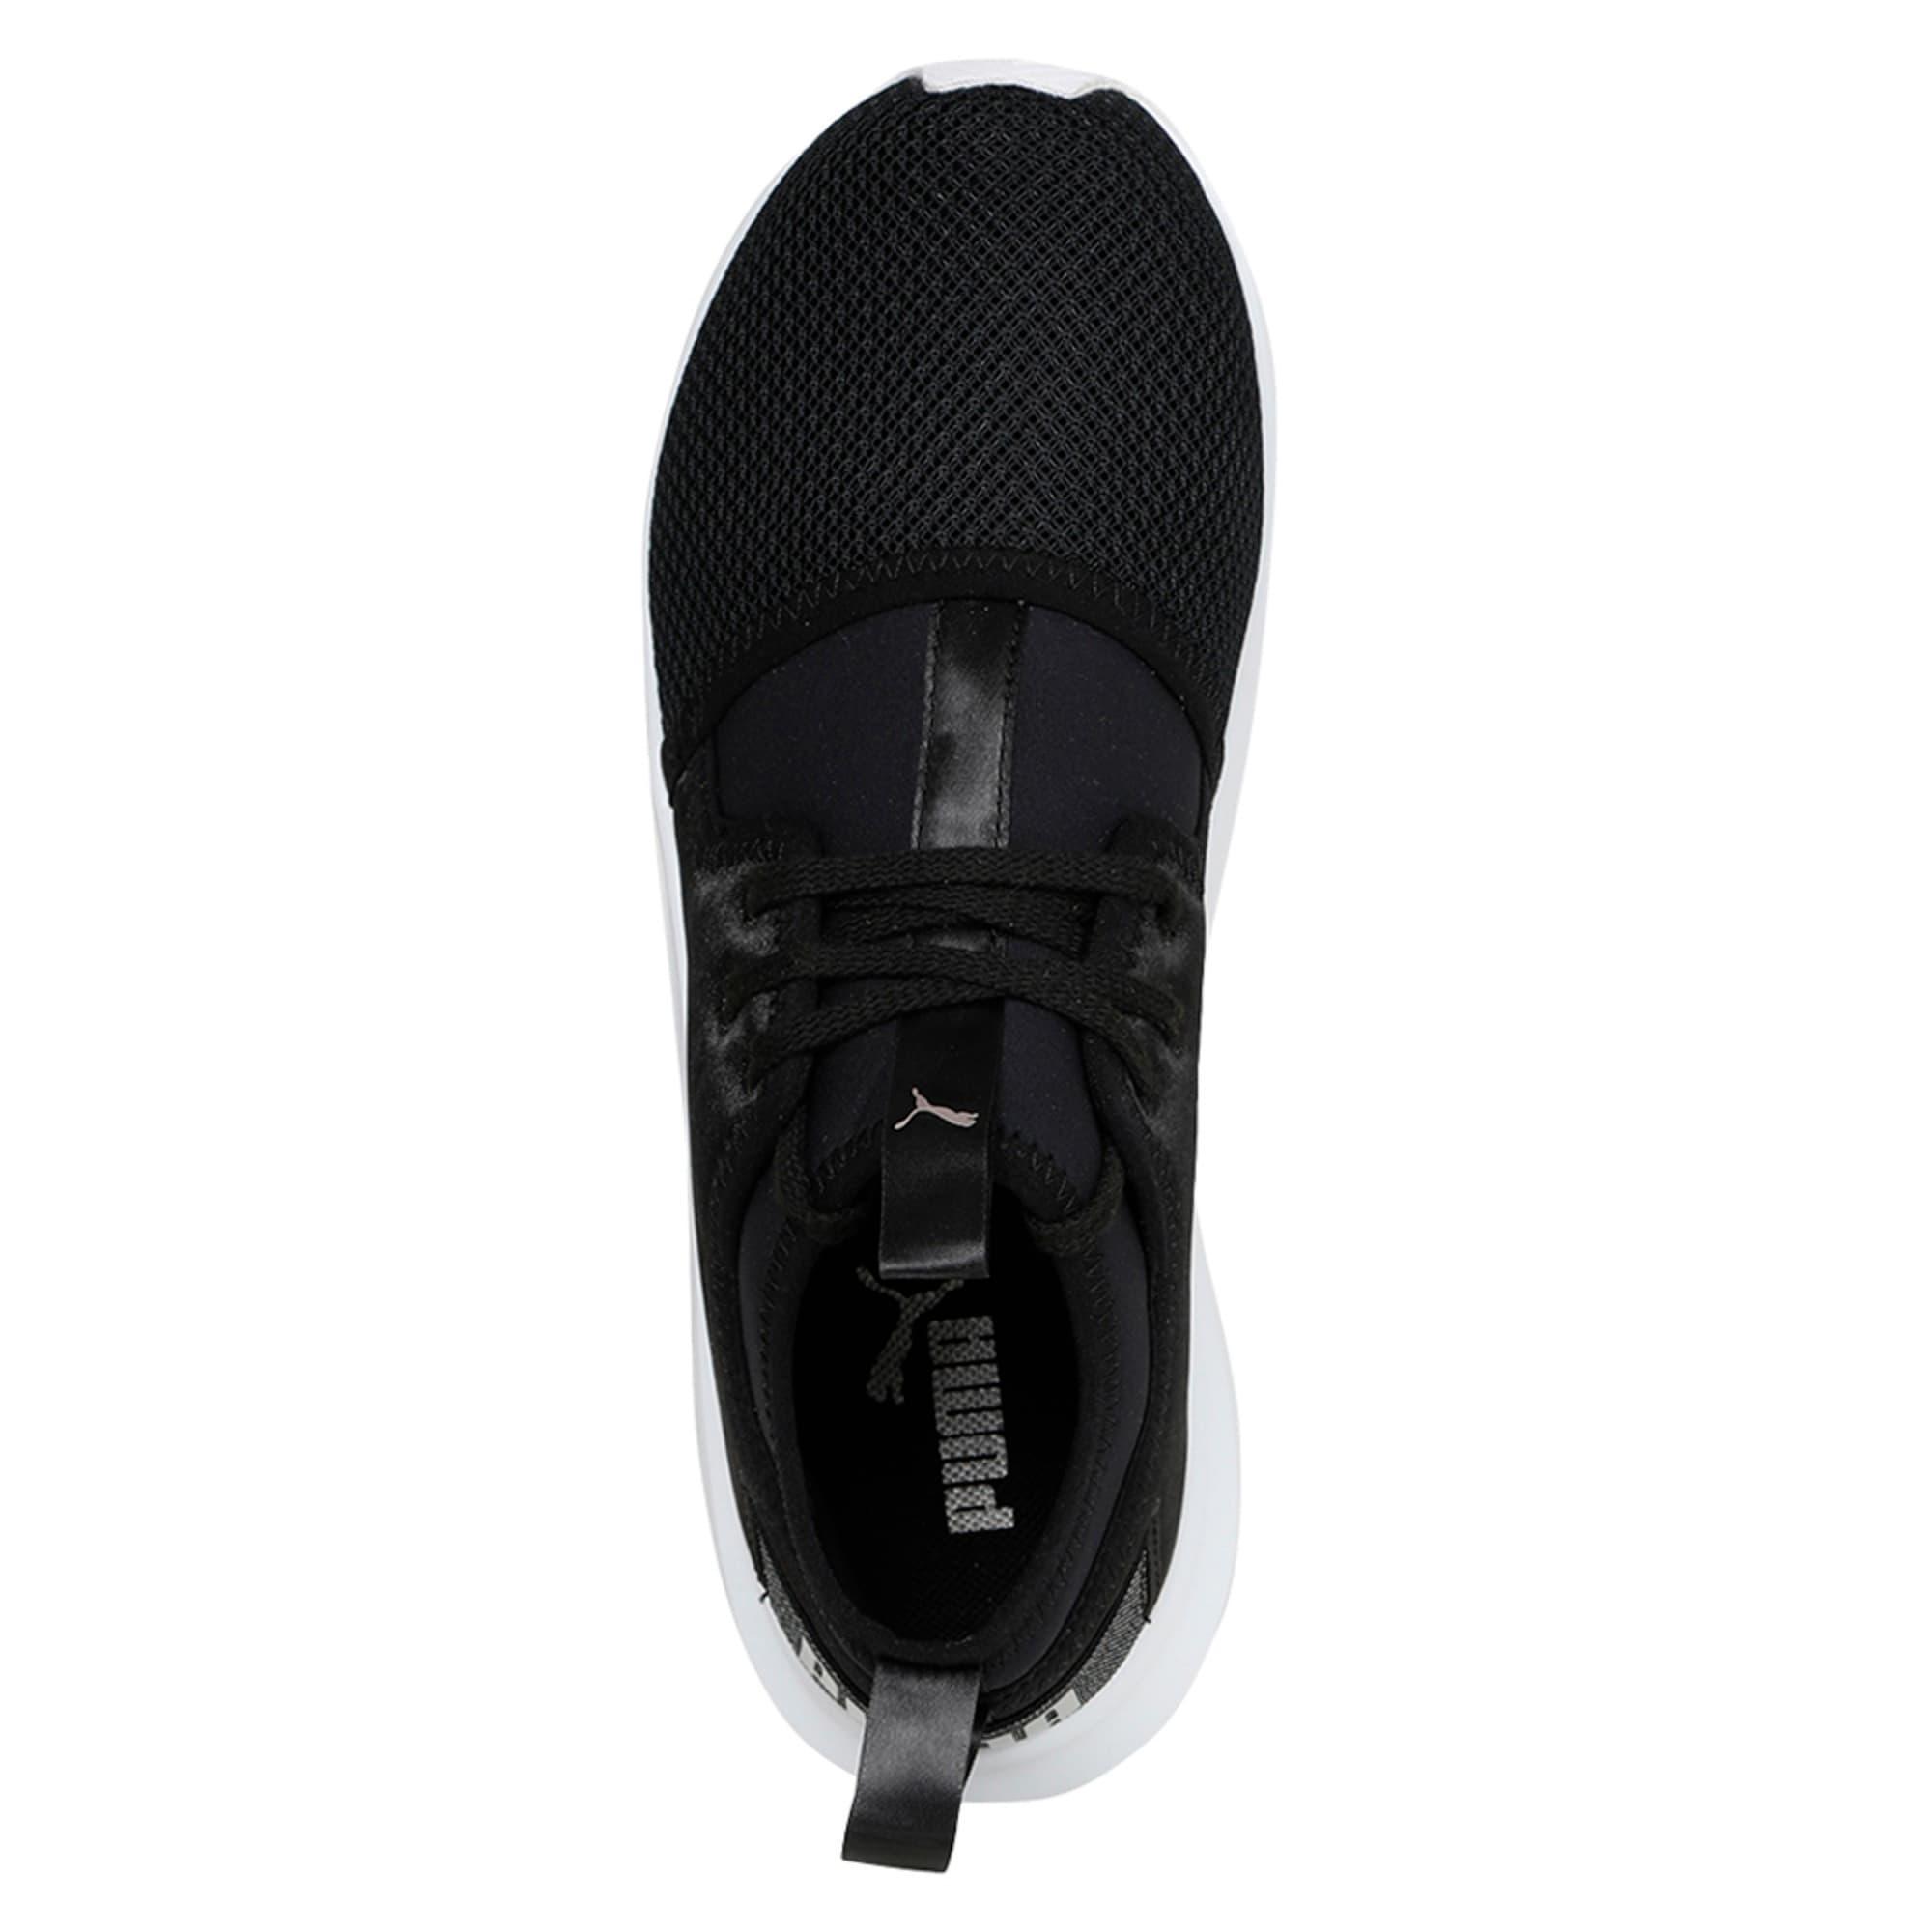 Thumbnail 3 of Phenom Satin Lo En Pointe Women's Training Shoes, Puma Black-Puma White, medium-IND